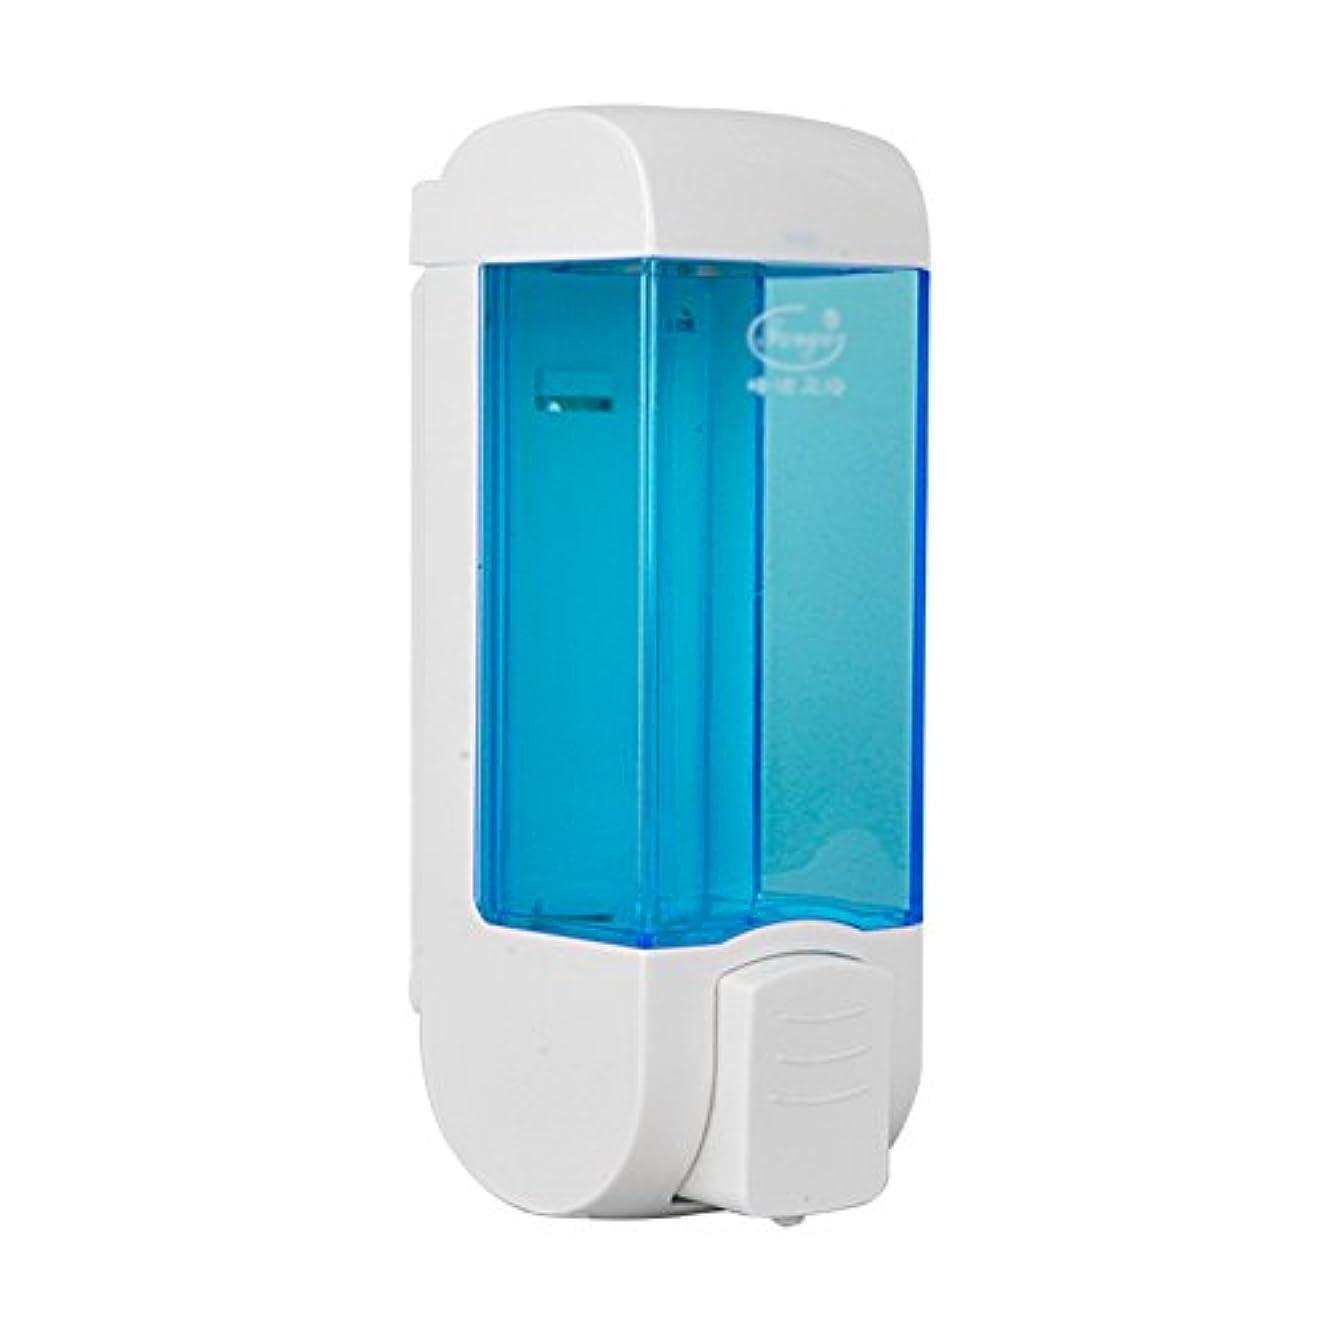 ZEMIN ソープディスペンサー 壁掛け式 石鹸ディスペンサー 帰納的 マニュアル ポンプ 2頭 シャンプー 液体 石鹸 クリーン、 プラスチック、 青、 300ML (色 : 1)